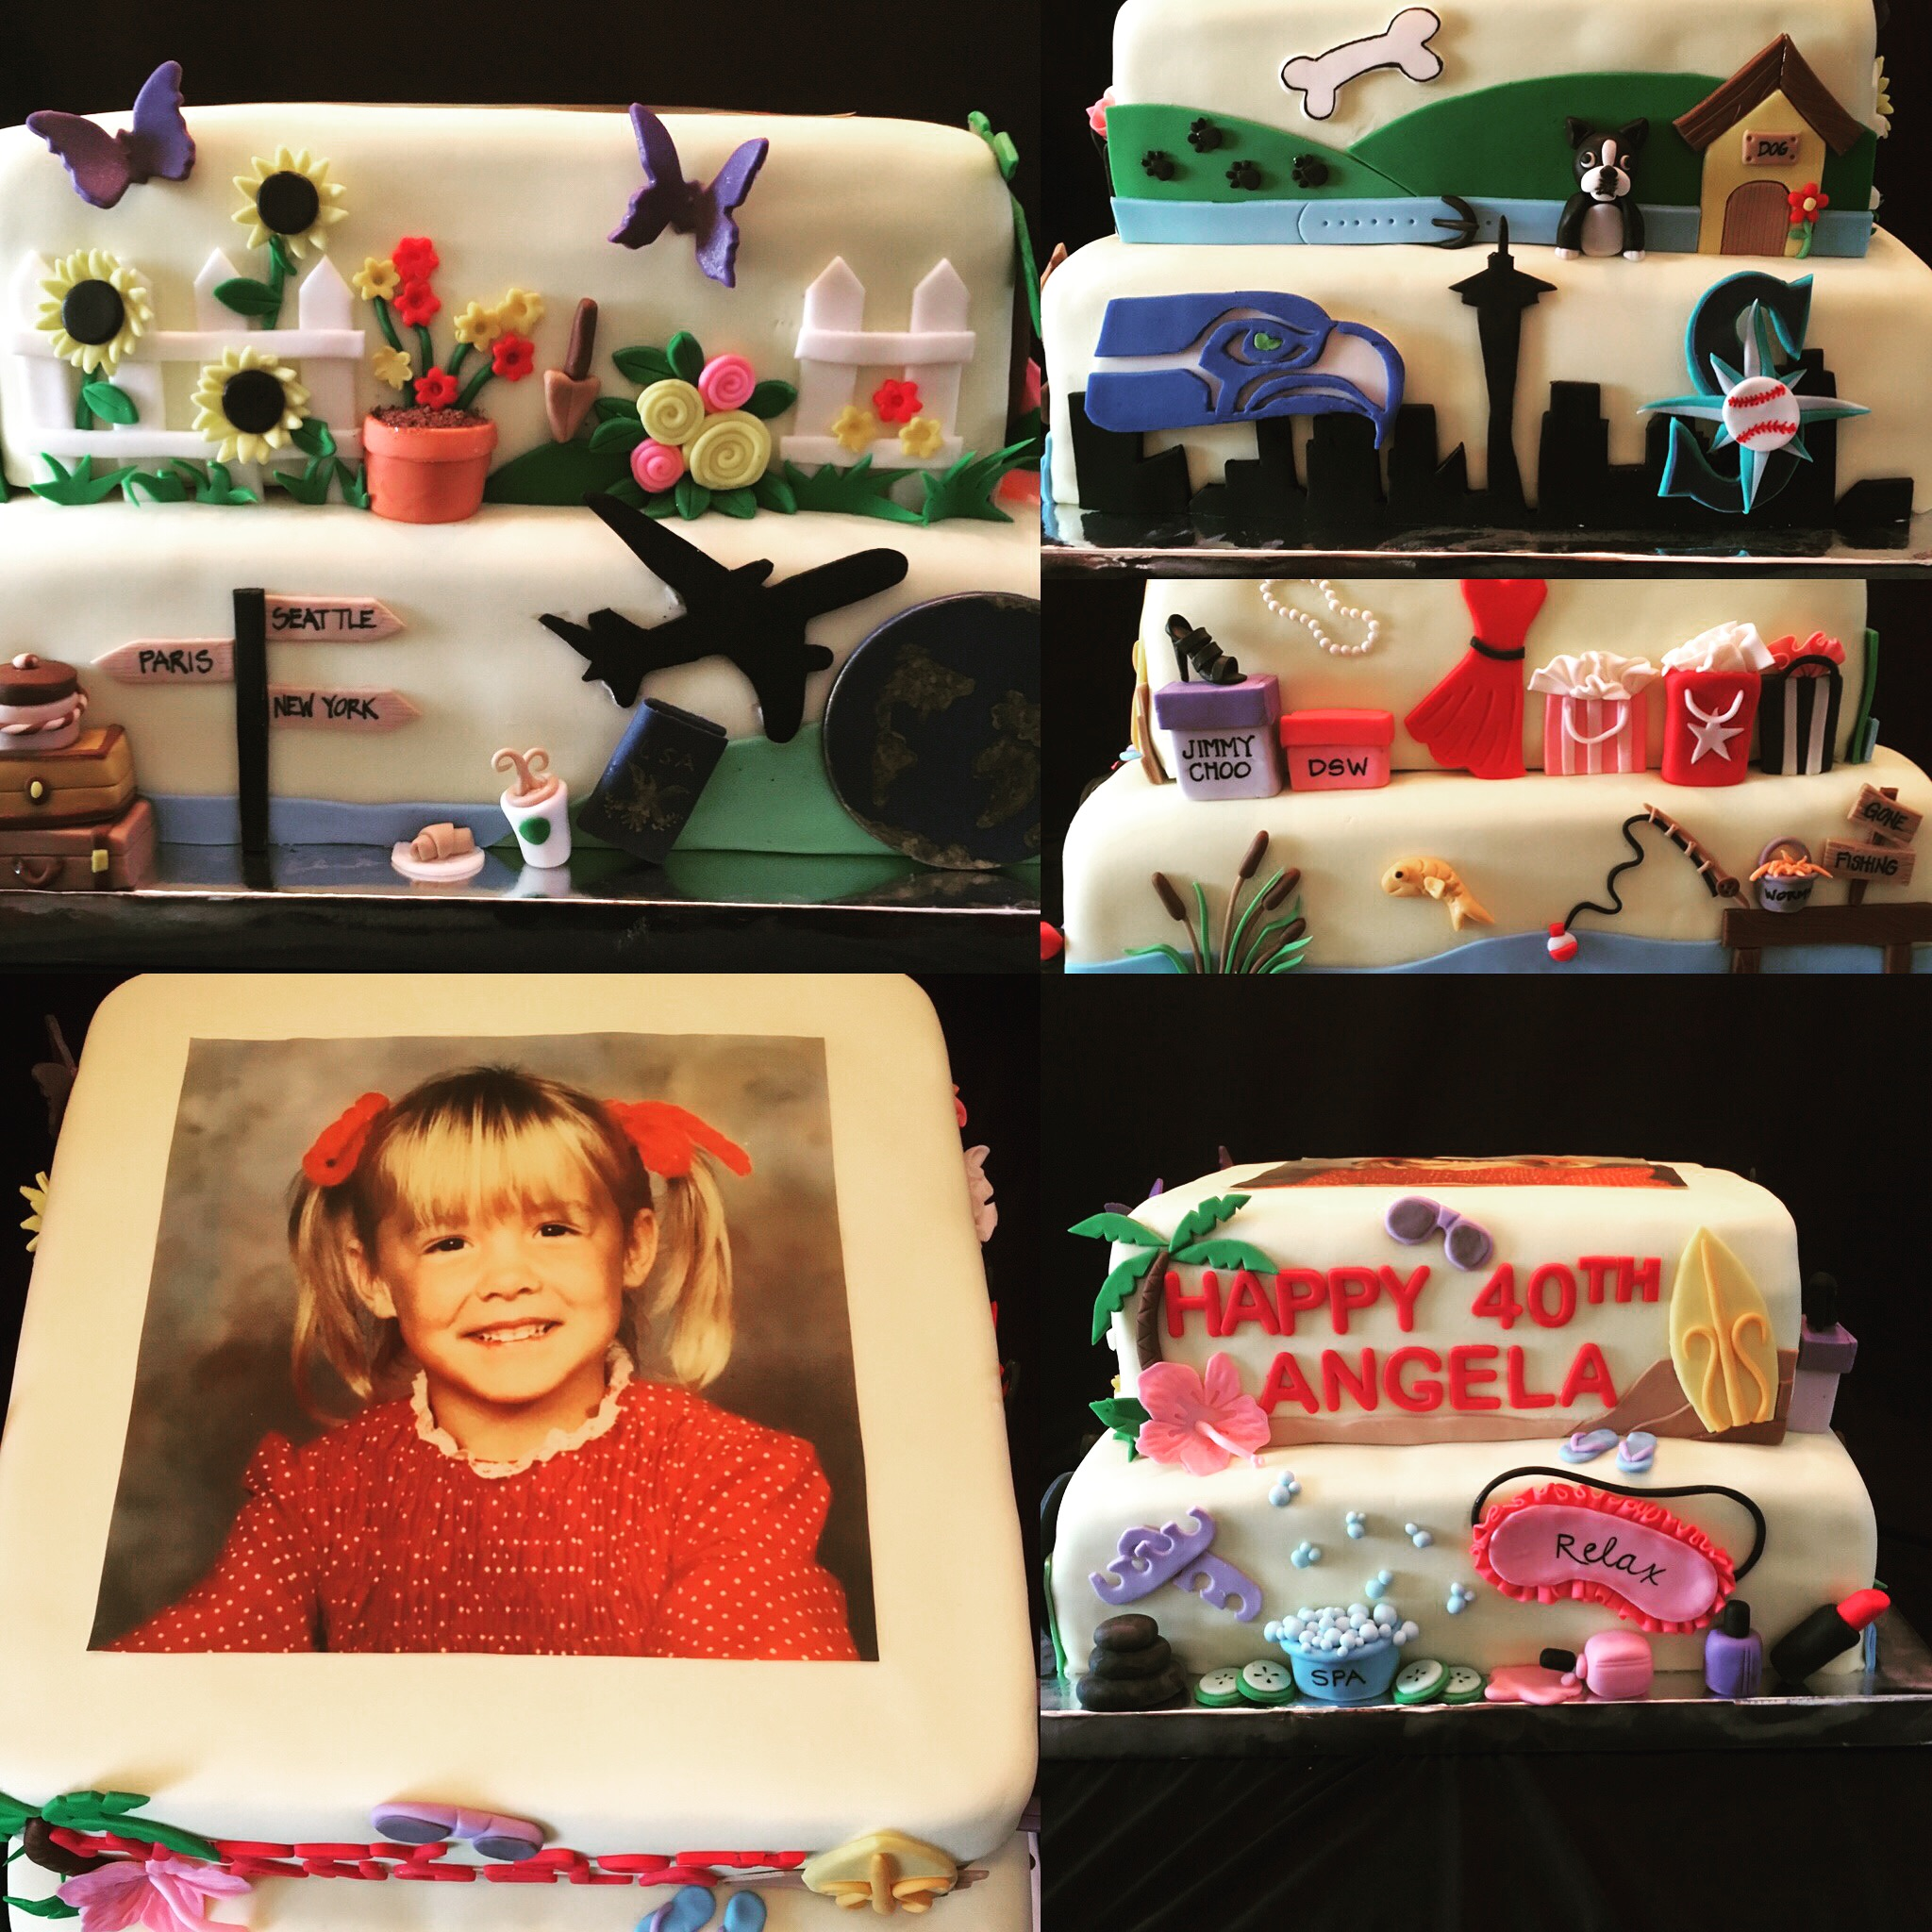 Her Favorite things cake